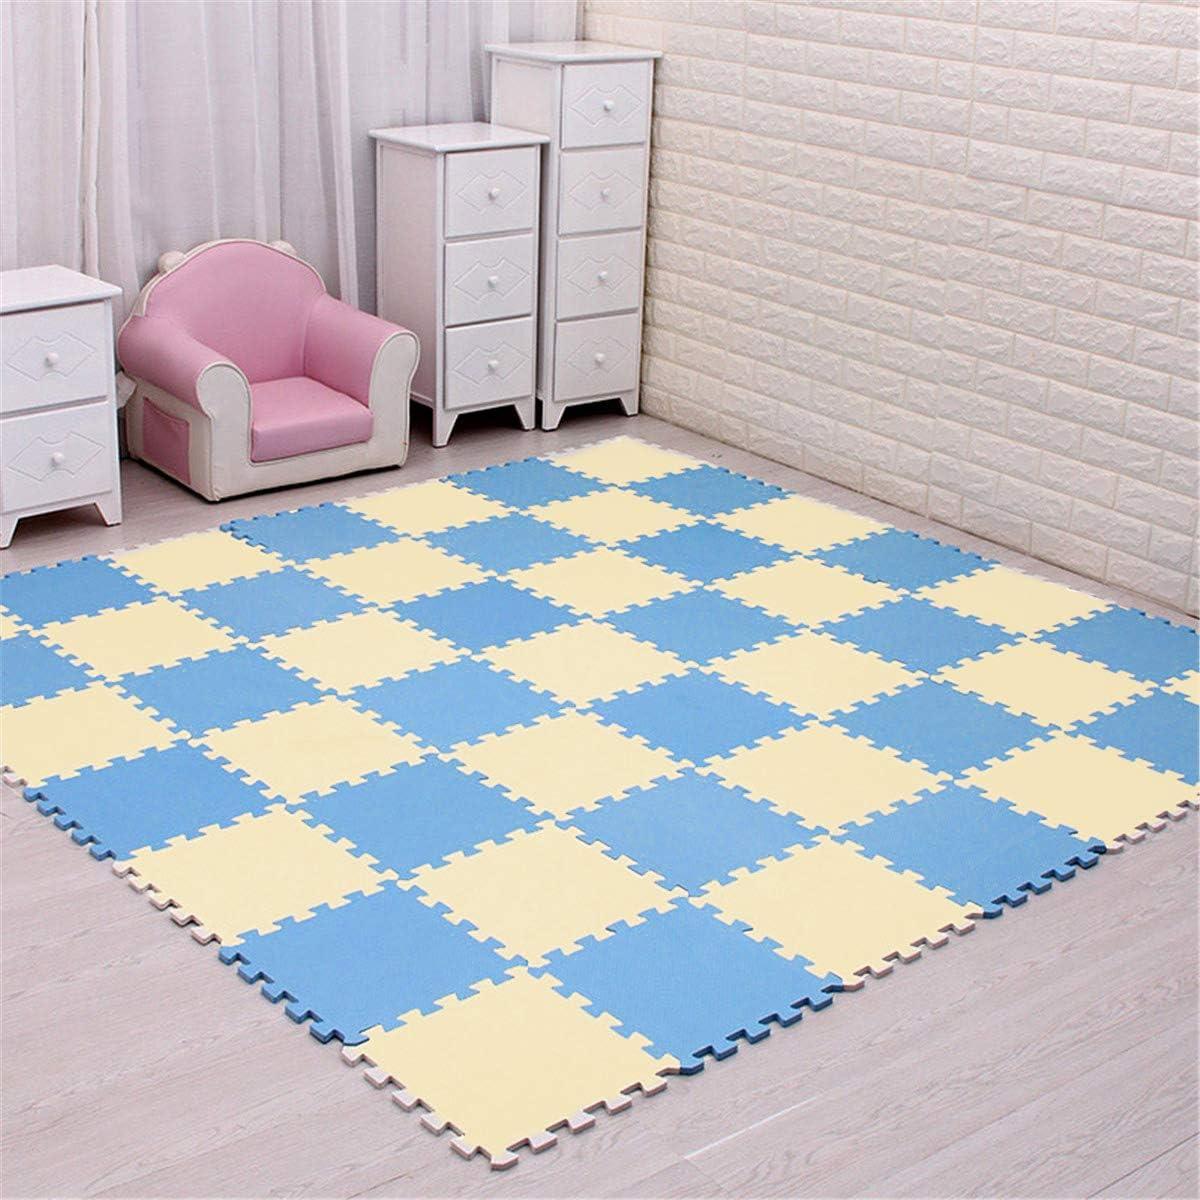 Cozylkx 11.8 x 11.8 Inch Kids EVA Foam Play Mat Yellow Blue,24 Tiles Puzzle Exercise Mat Interlocking Floor Tiles for Protective /& Nursery